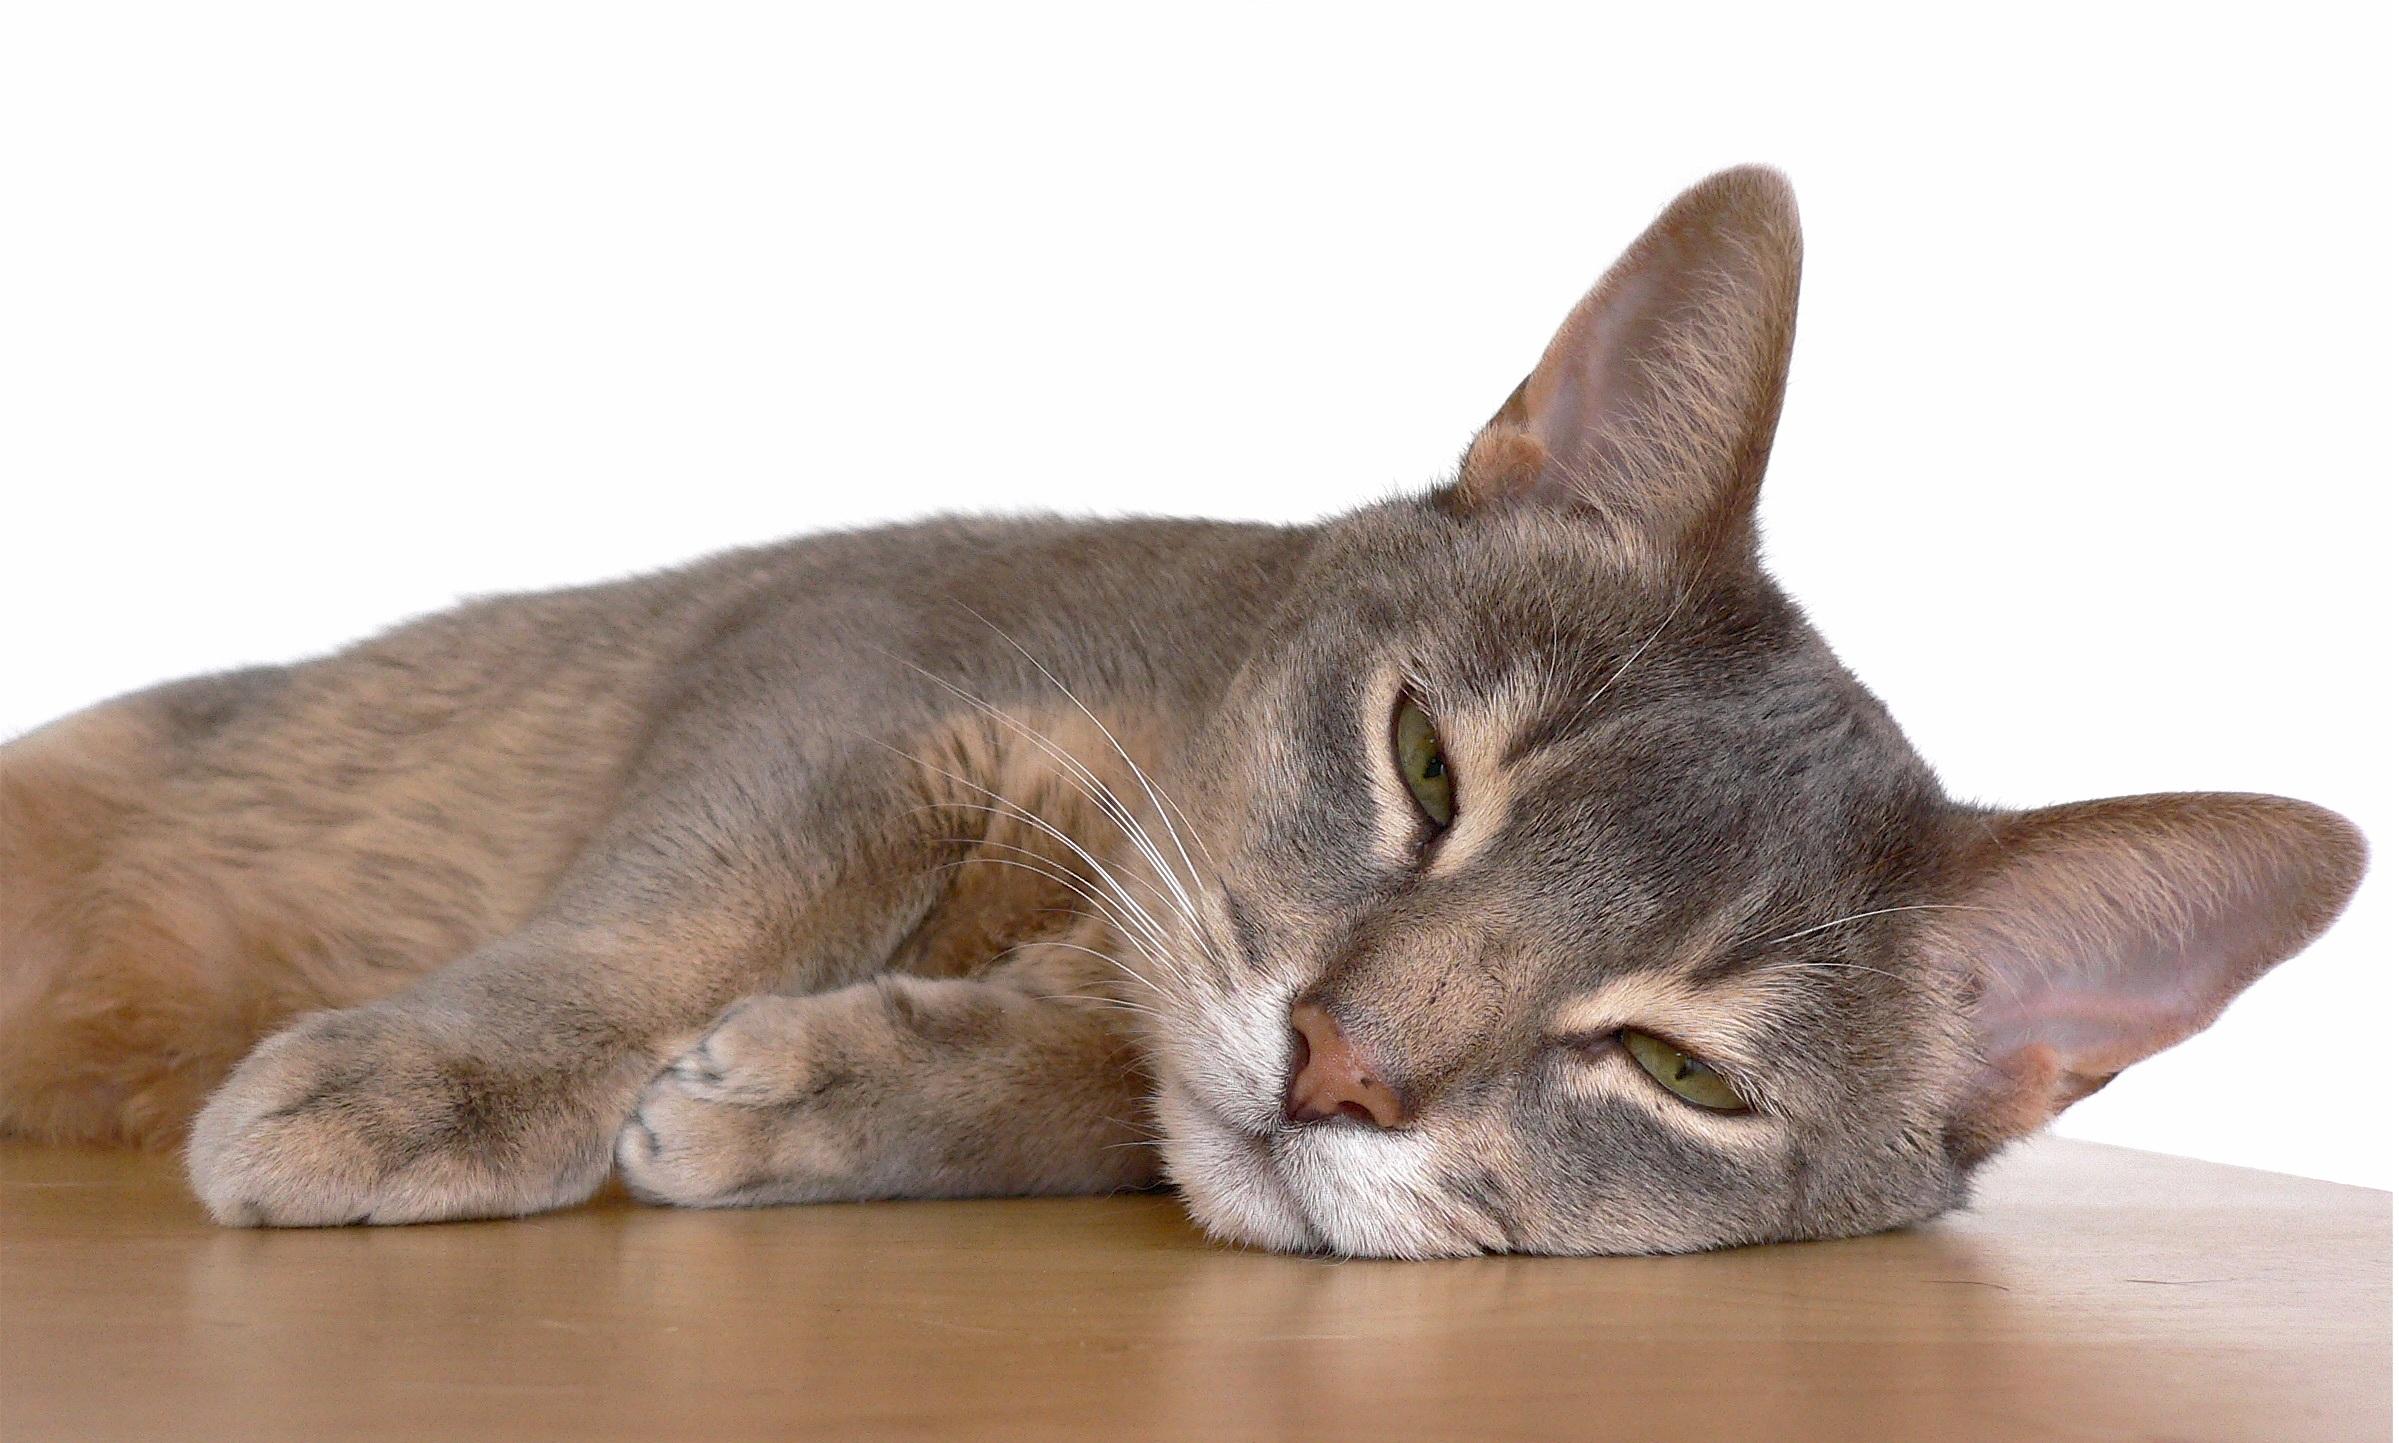 Free animal pet usa feline nose whiskers vertebrate